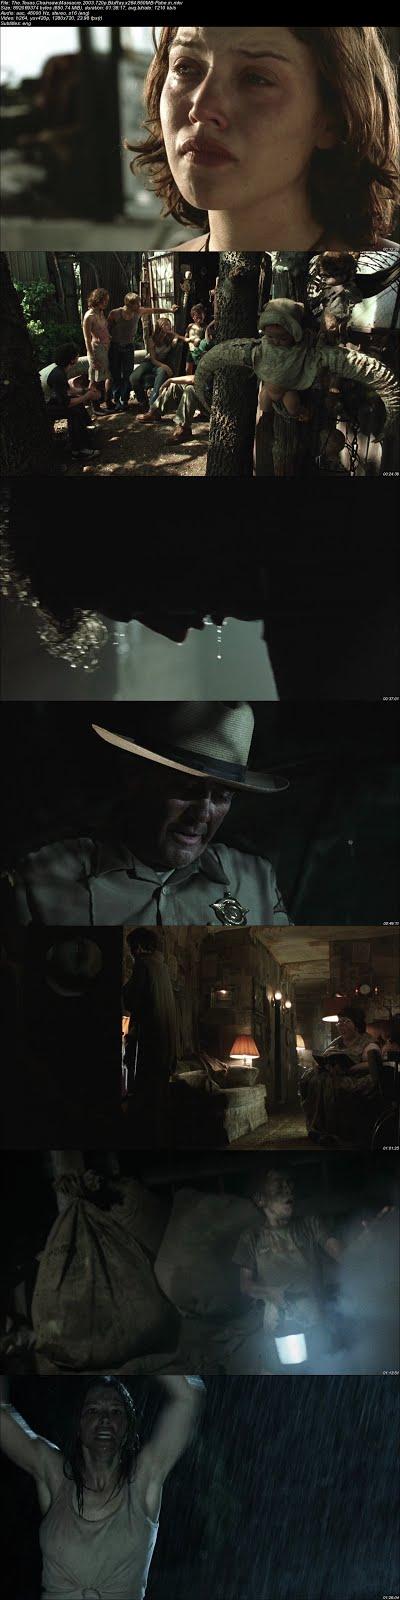 The Texas Chainsaw Massacre (2003) English 480p BRRip 400Mb Download Full Movie